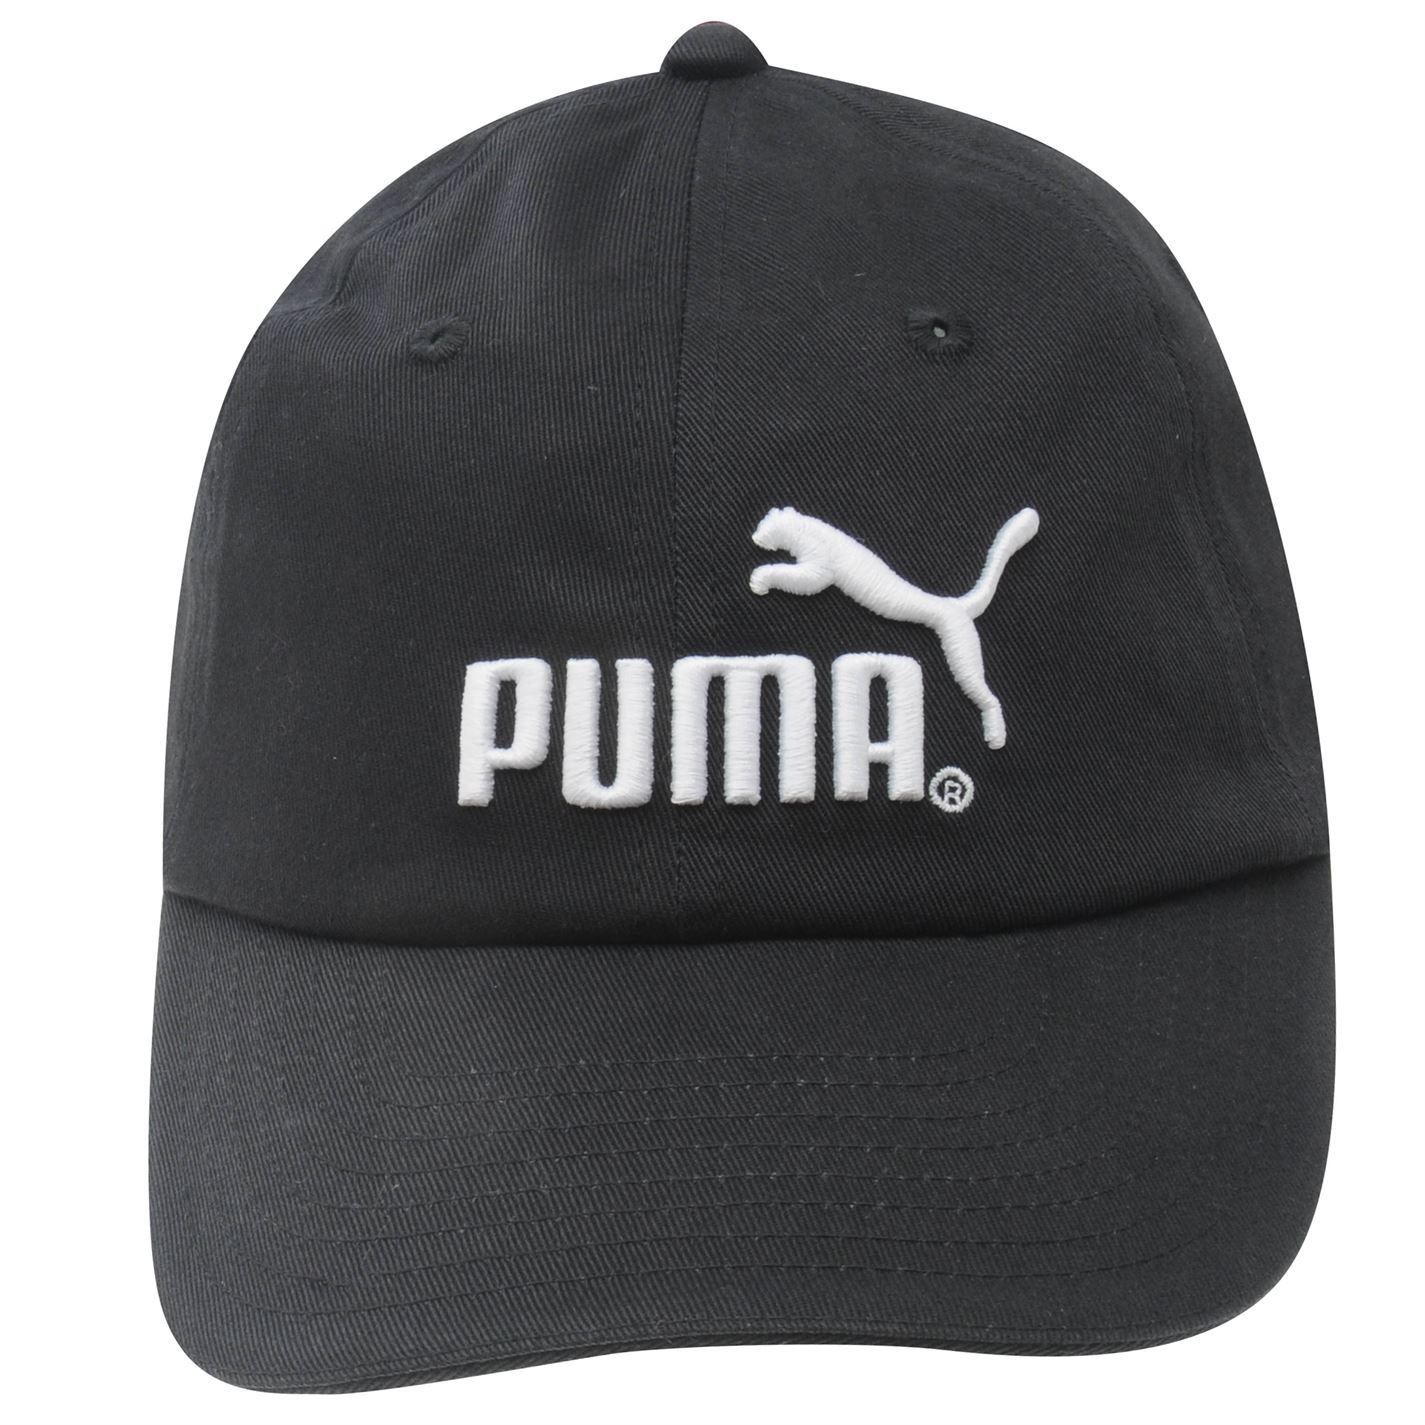 Puma Kids Children Juniors Essential Cap Headwear Hats Accessories